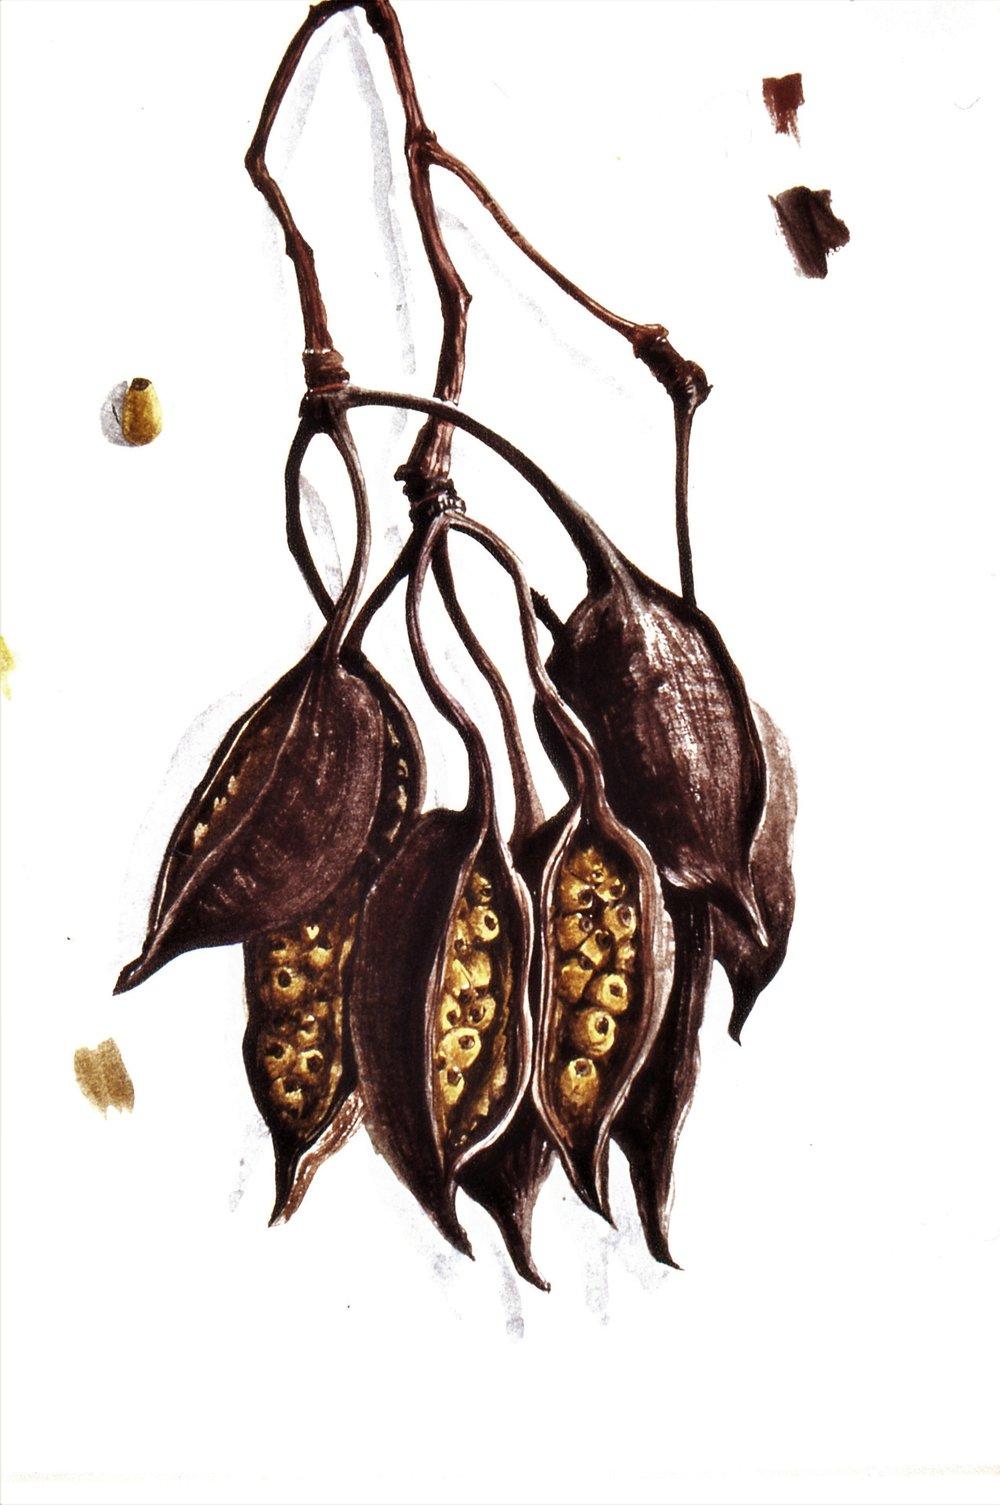 8_Seed Pod _Papua_New_Guinea_1993SirCharlesBurrellCollectionWATERCOLOURSTUDY.jpg